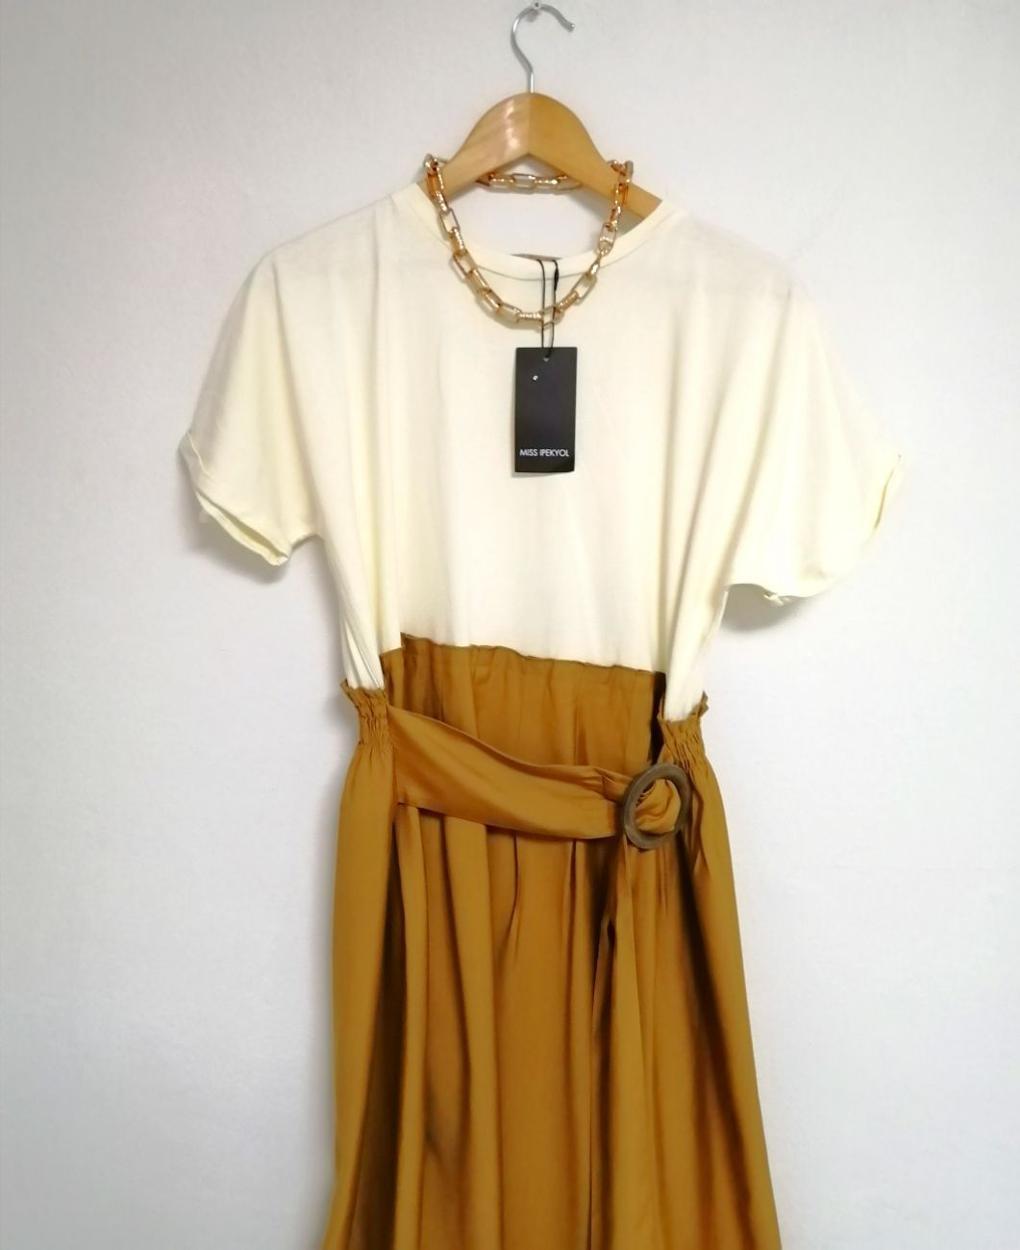 İpekyol Uzun Elbise